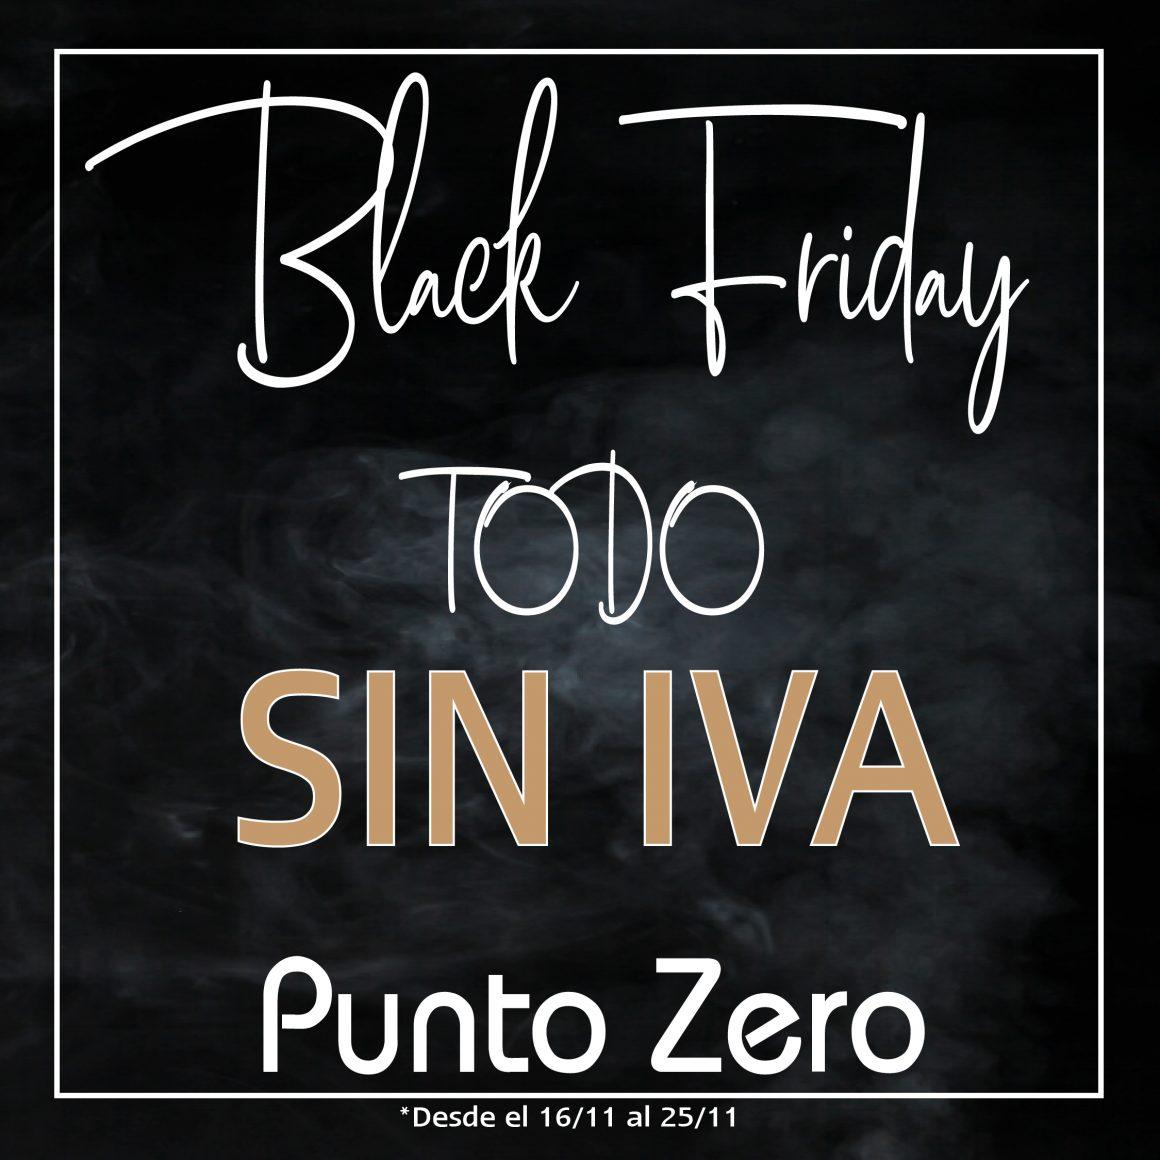 Black Friday en Punto Zero